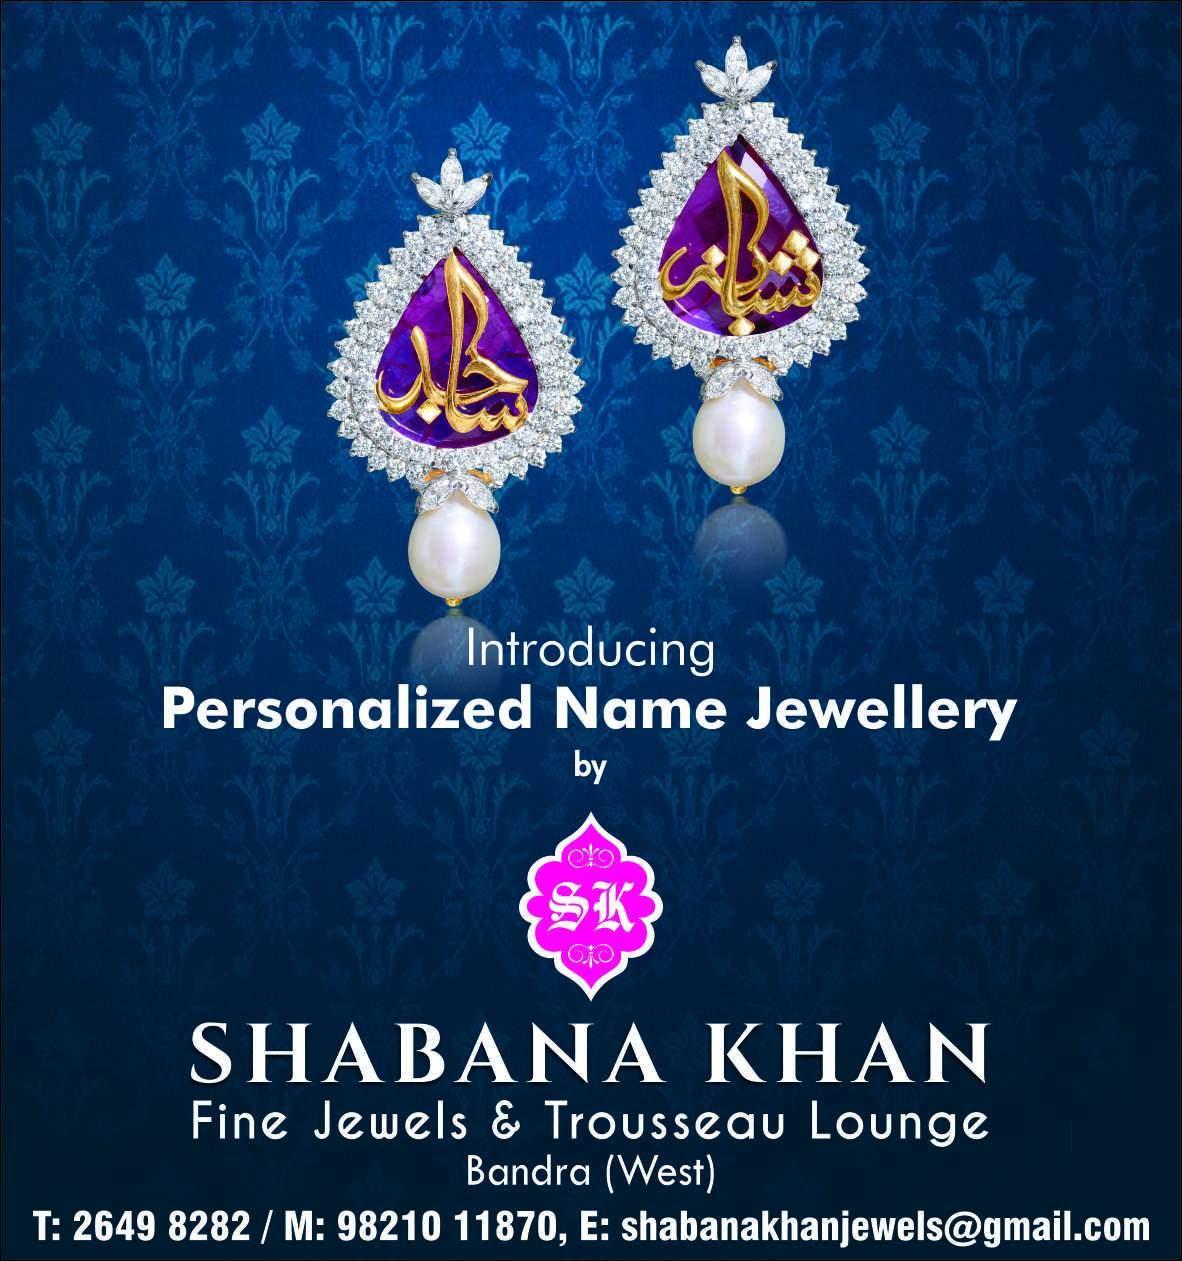 Shabbir Name Wallpaper Source Shabana Khan Name 765677 Hd Wallpaper Backgrounds Download